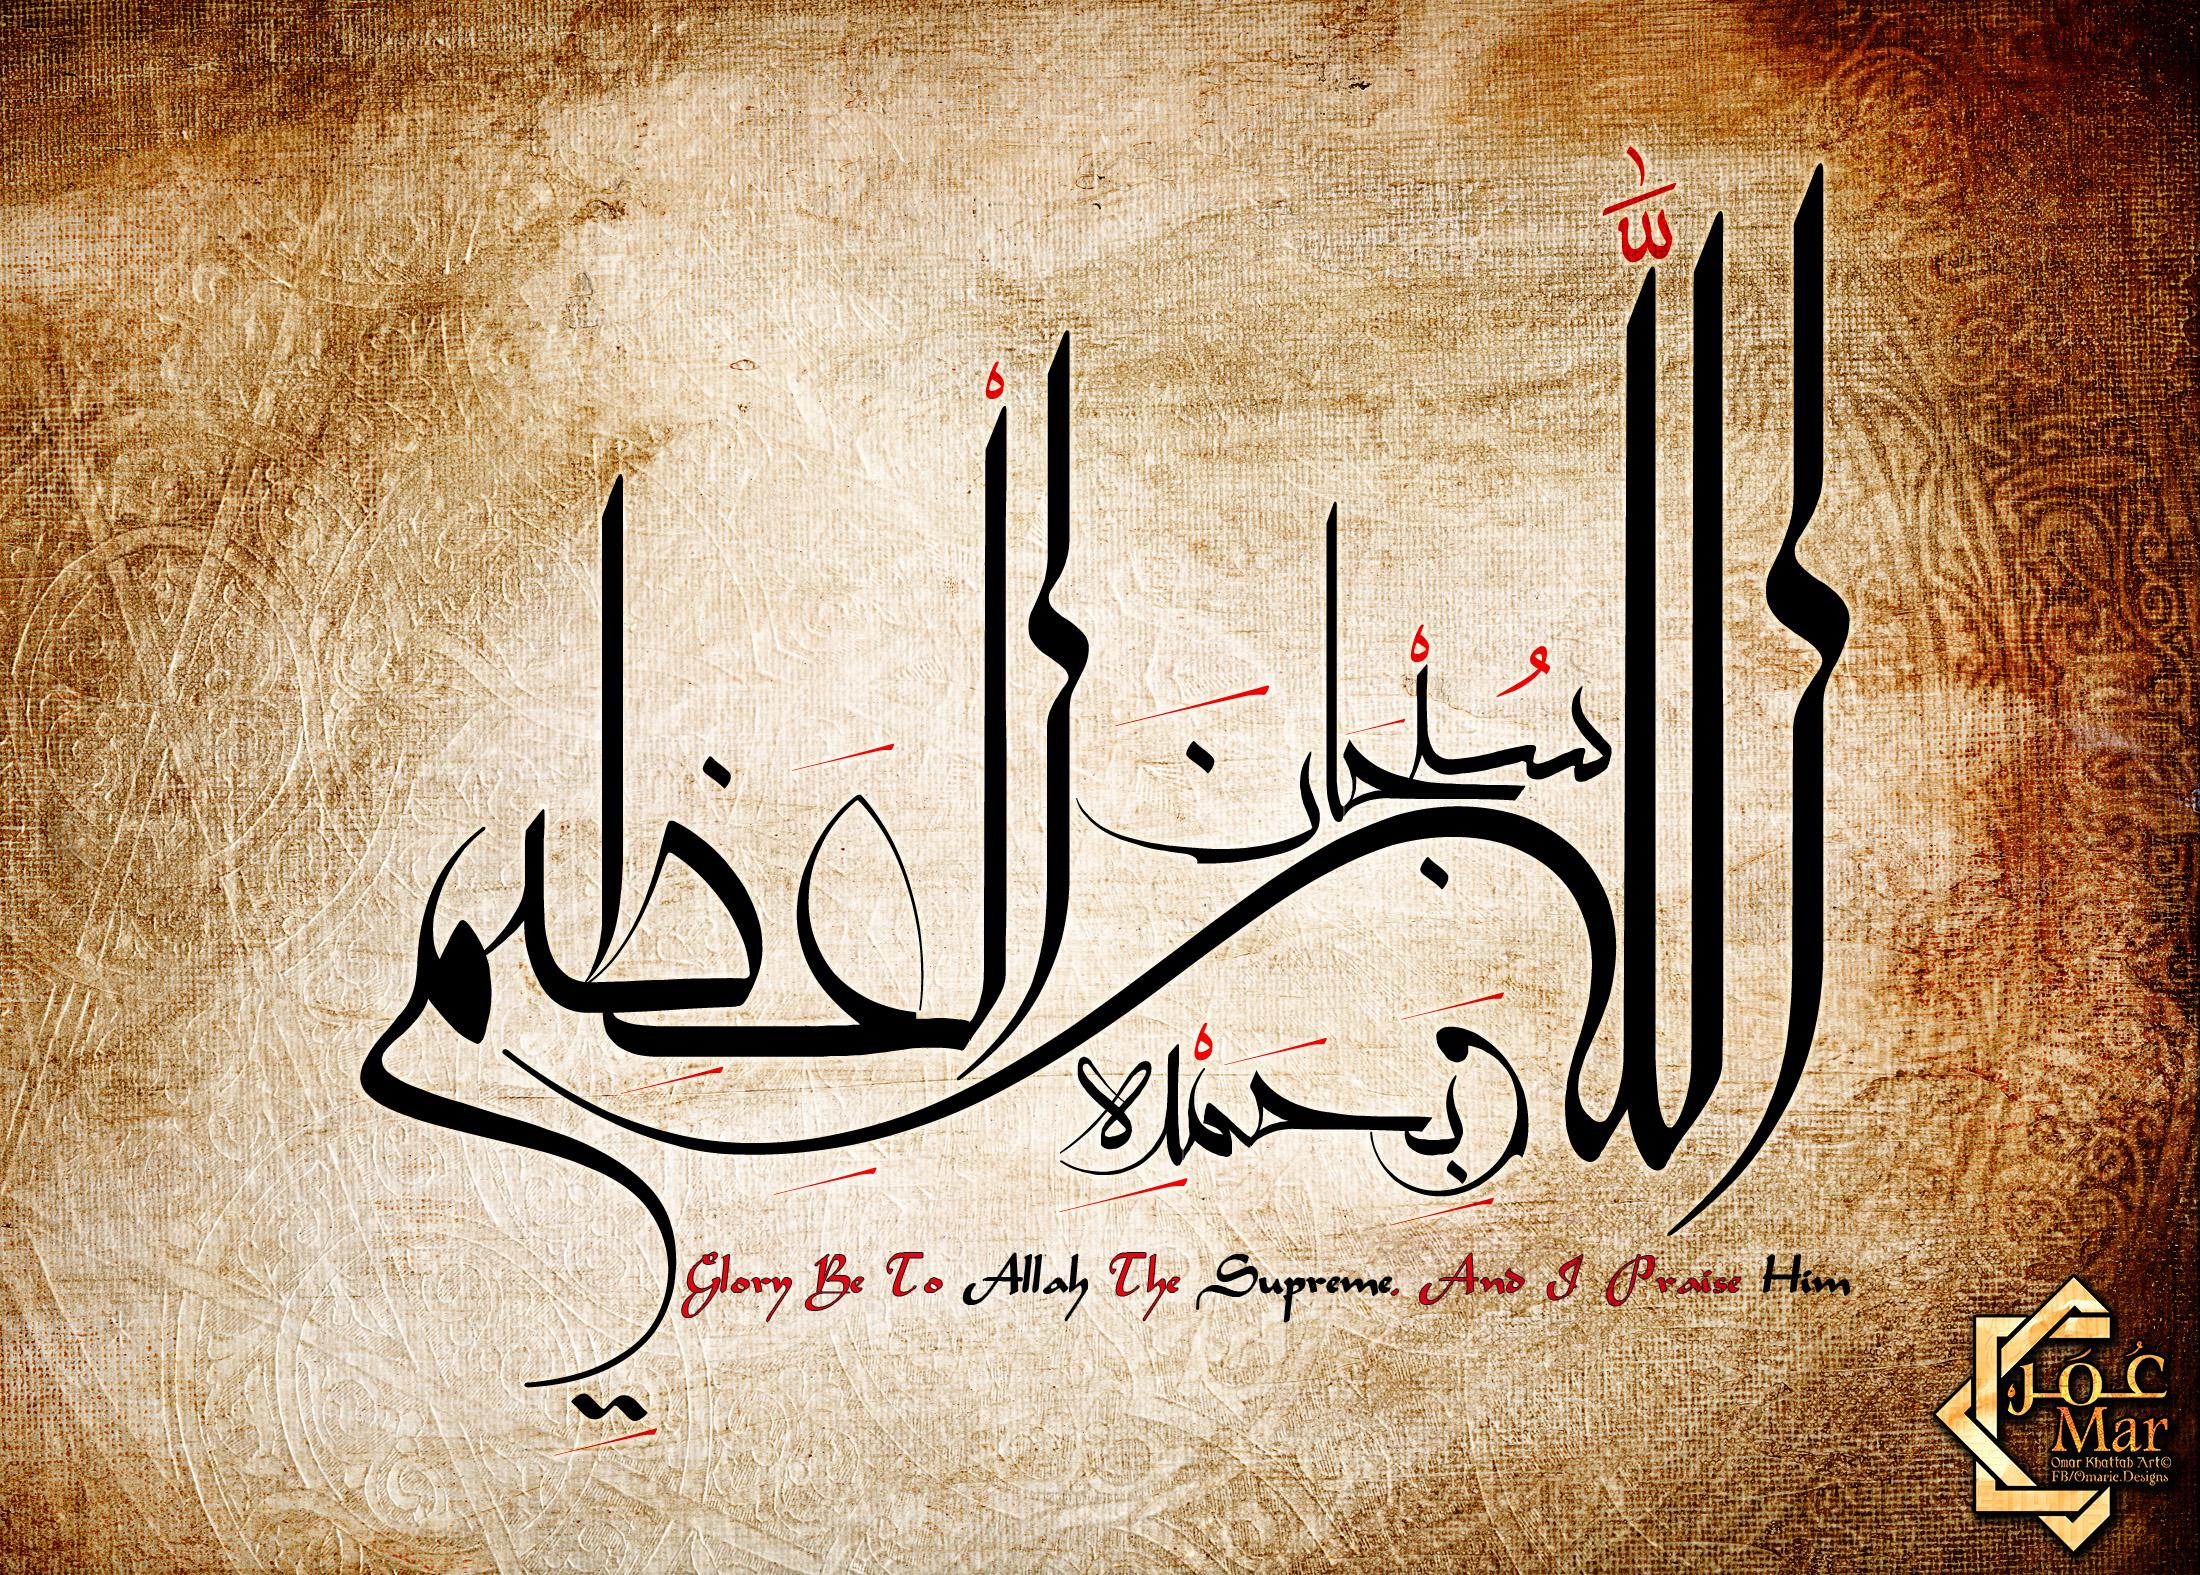 Subhan'Allah by Omar-Khattab on DeviantArt